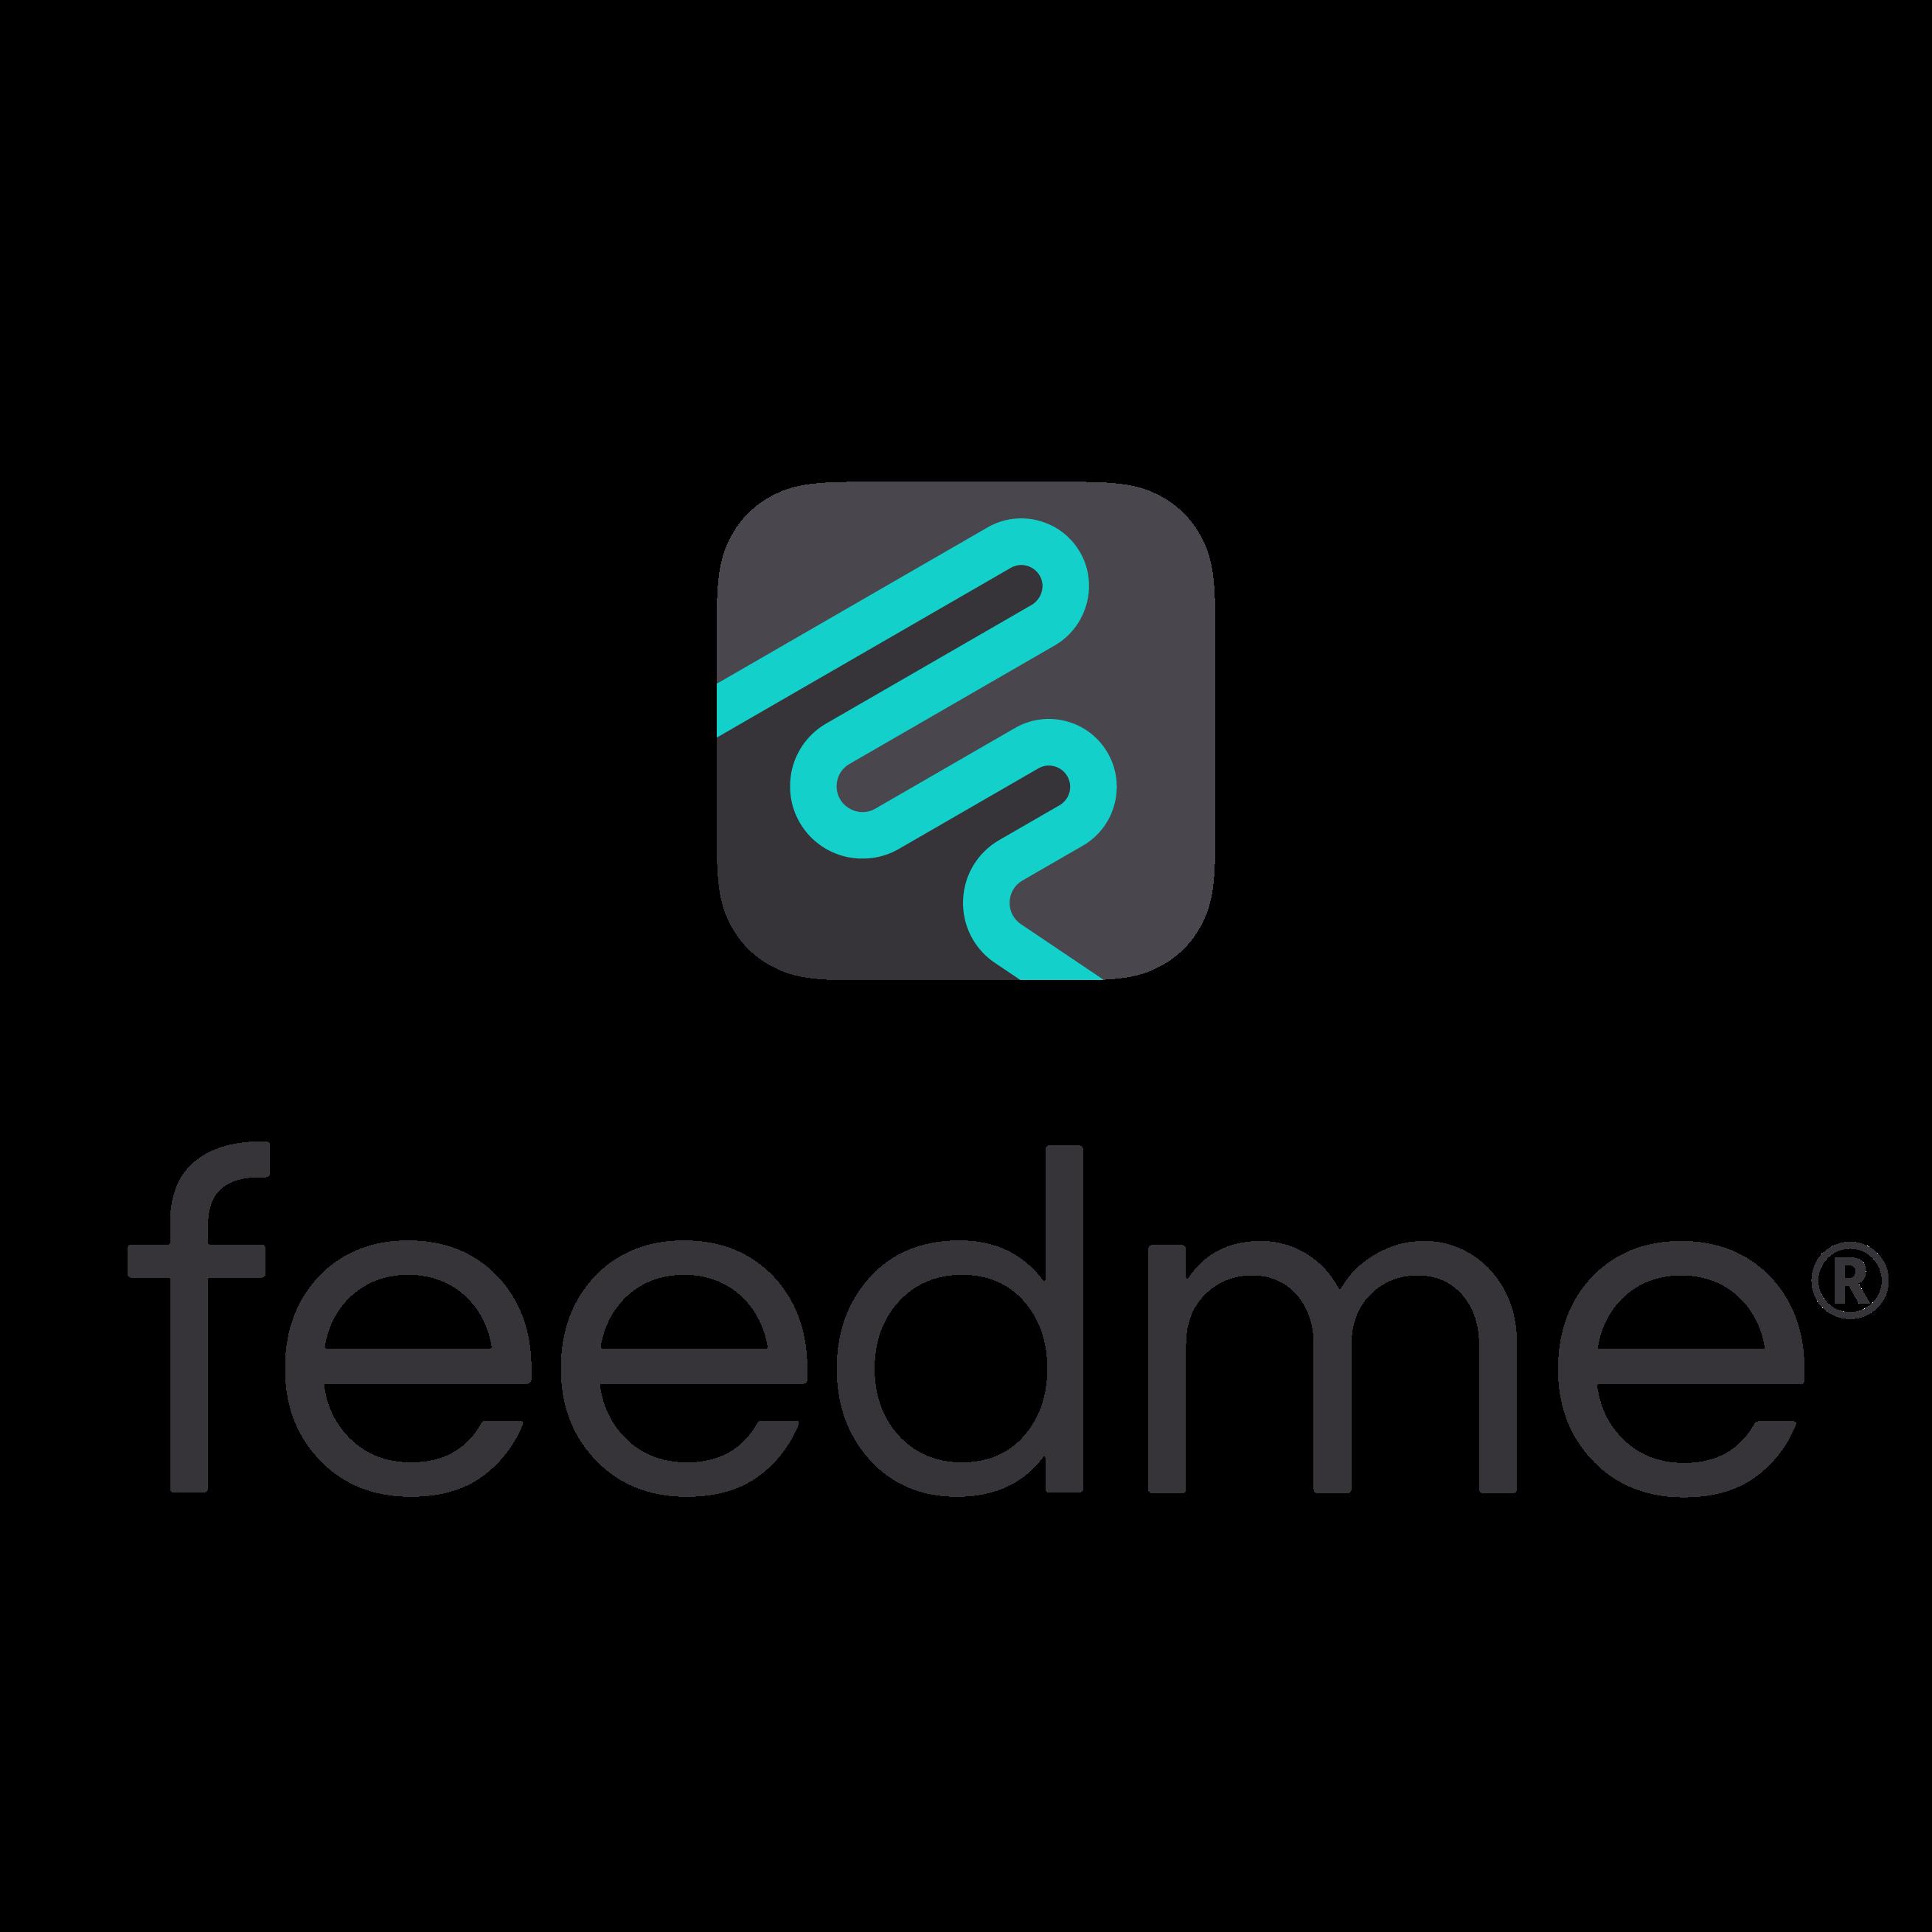 Feedme®